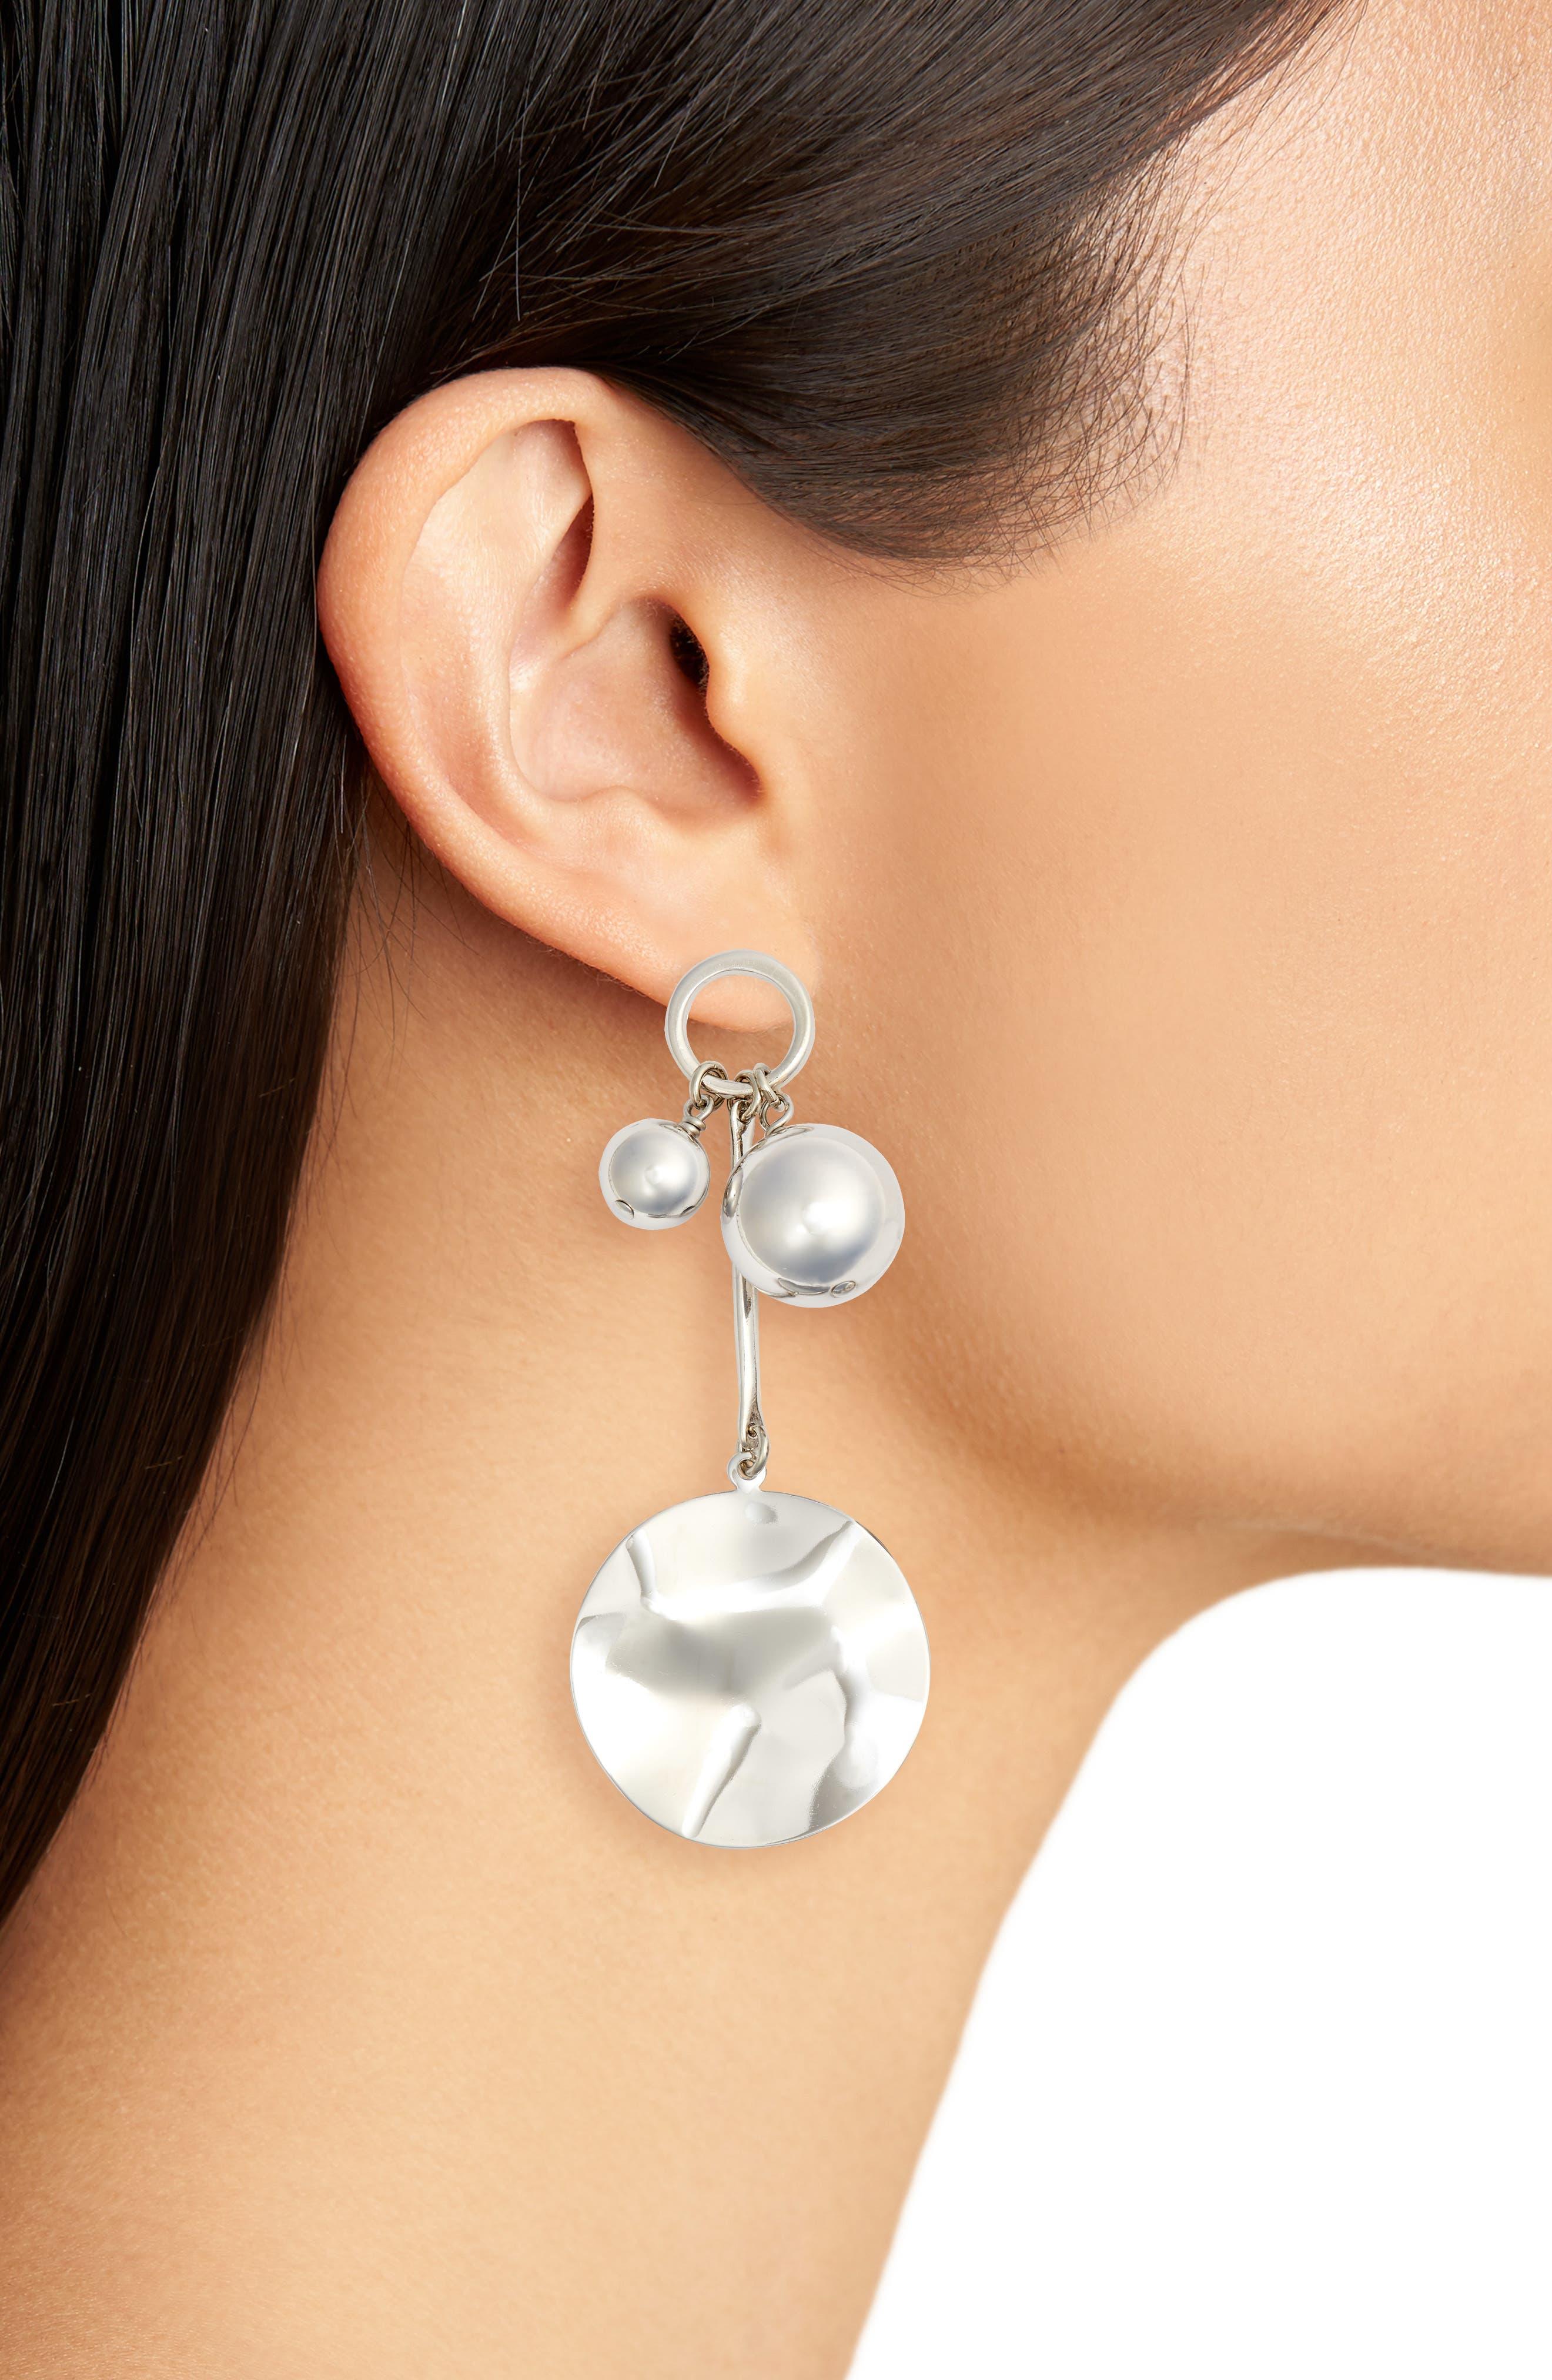 BIKO, Joyride Stud Earrings, Alternate thumbnail 2, color, 040